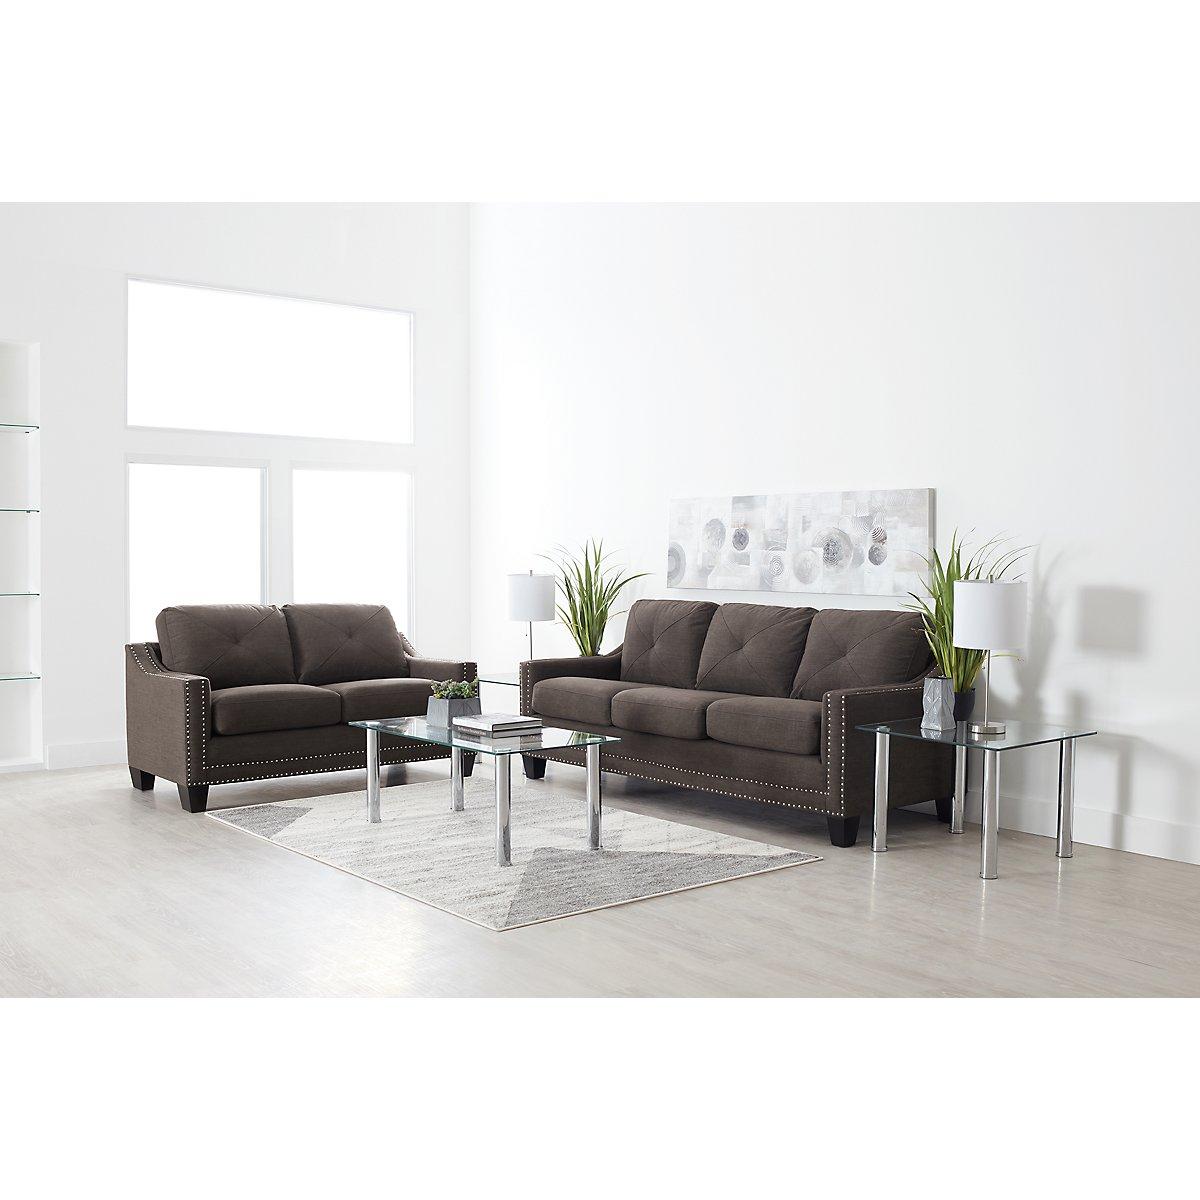 City Furniture: Malone Dark Gray Microfiber Loveseat